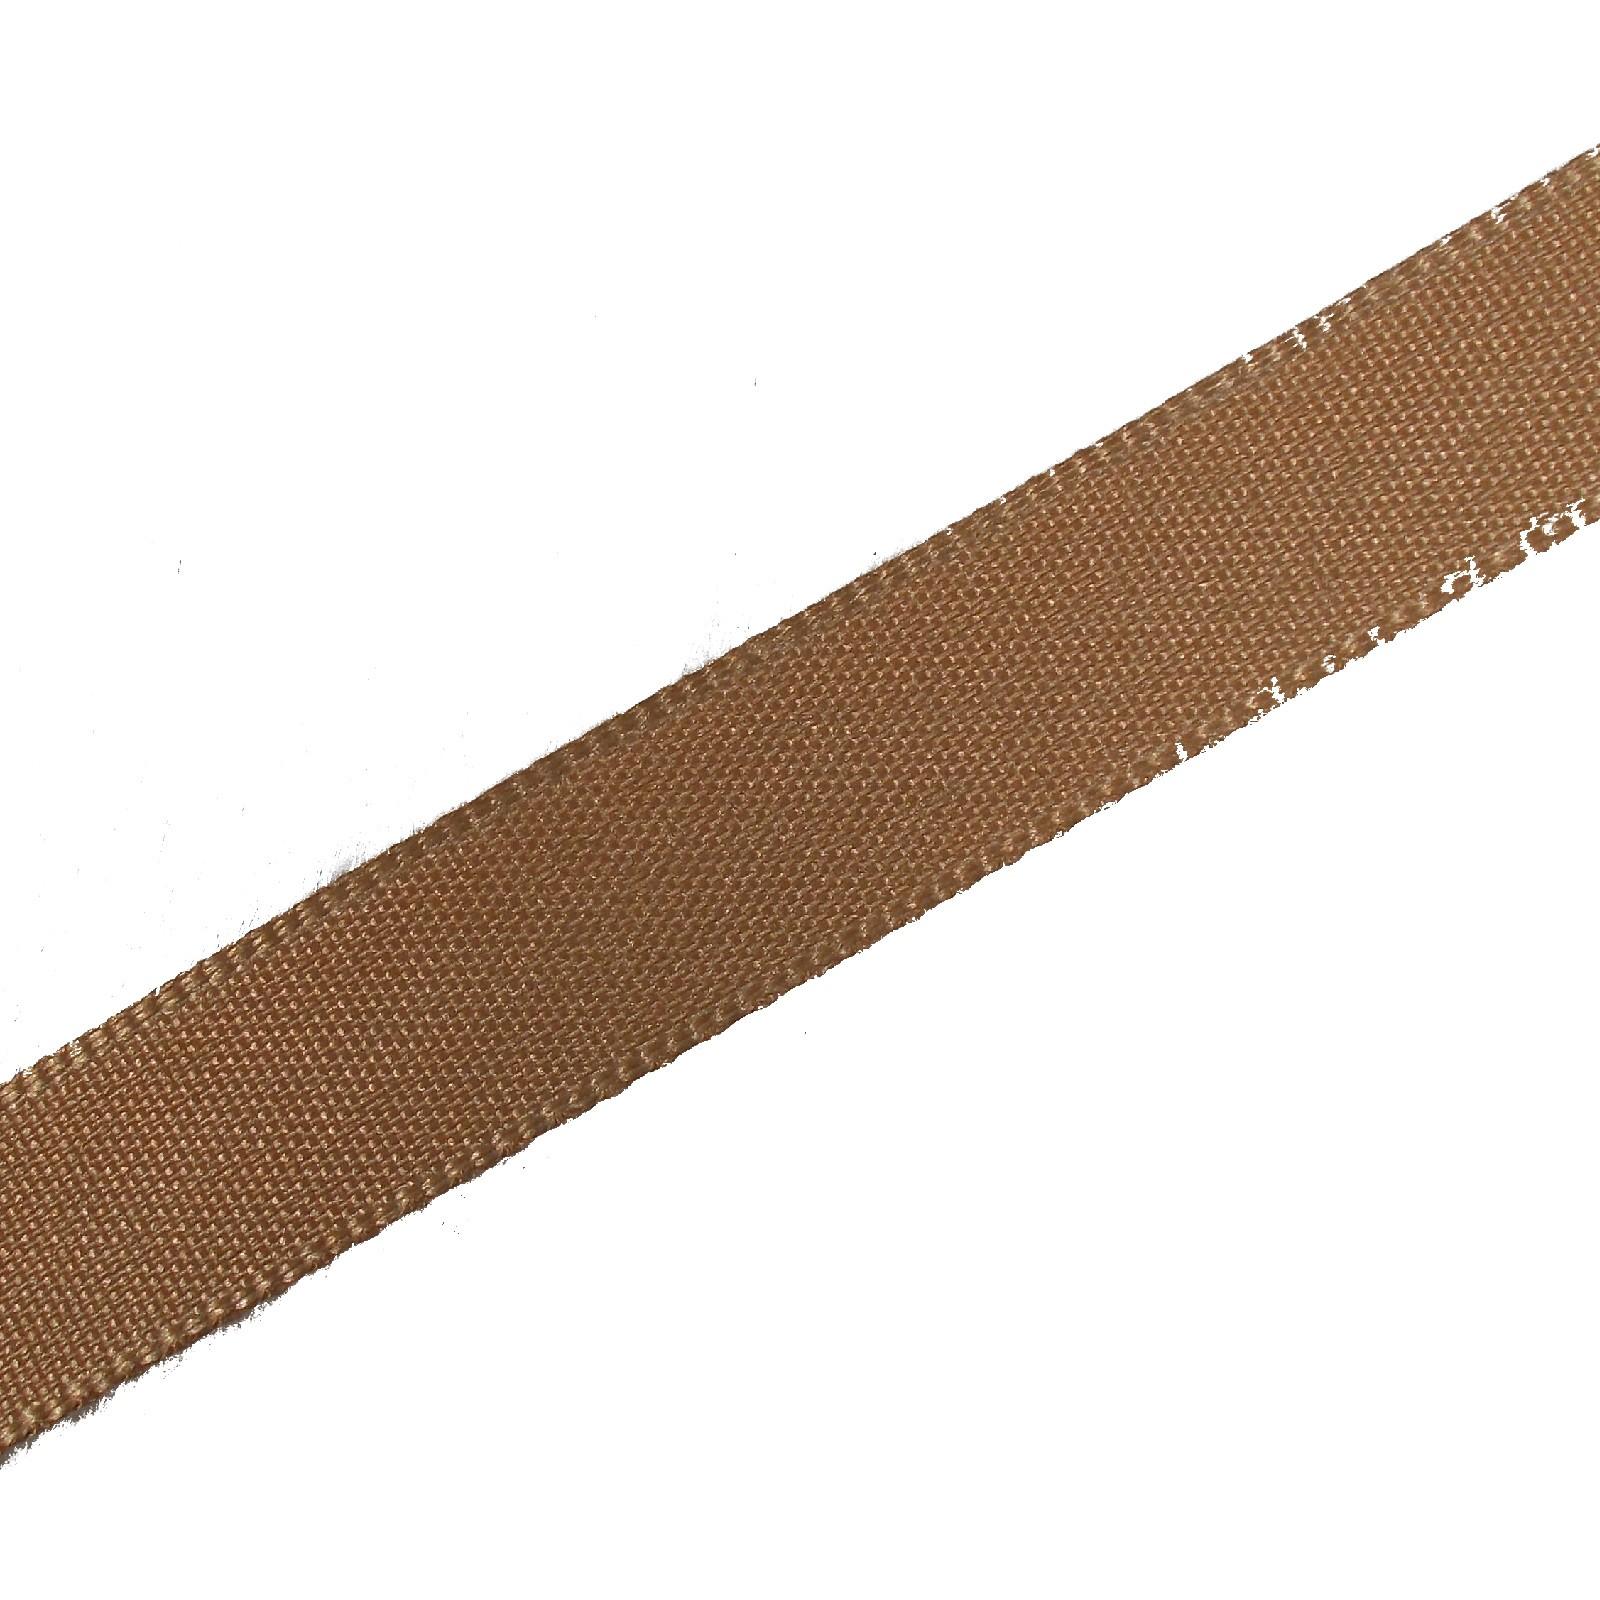 Berisfords Seam Binding Polyester Ribbon Tape 12mm wide Dark Beige 3 metre length